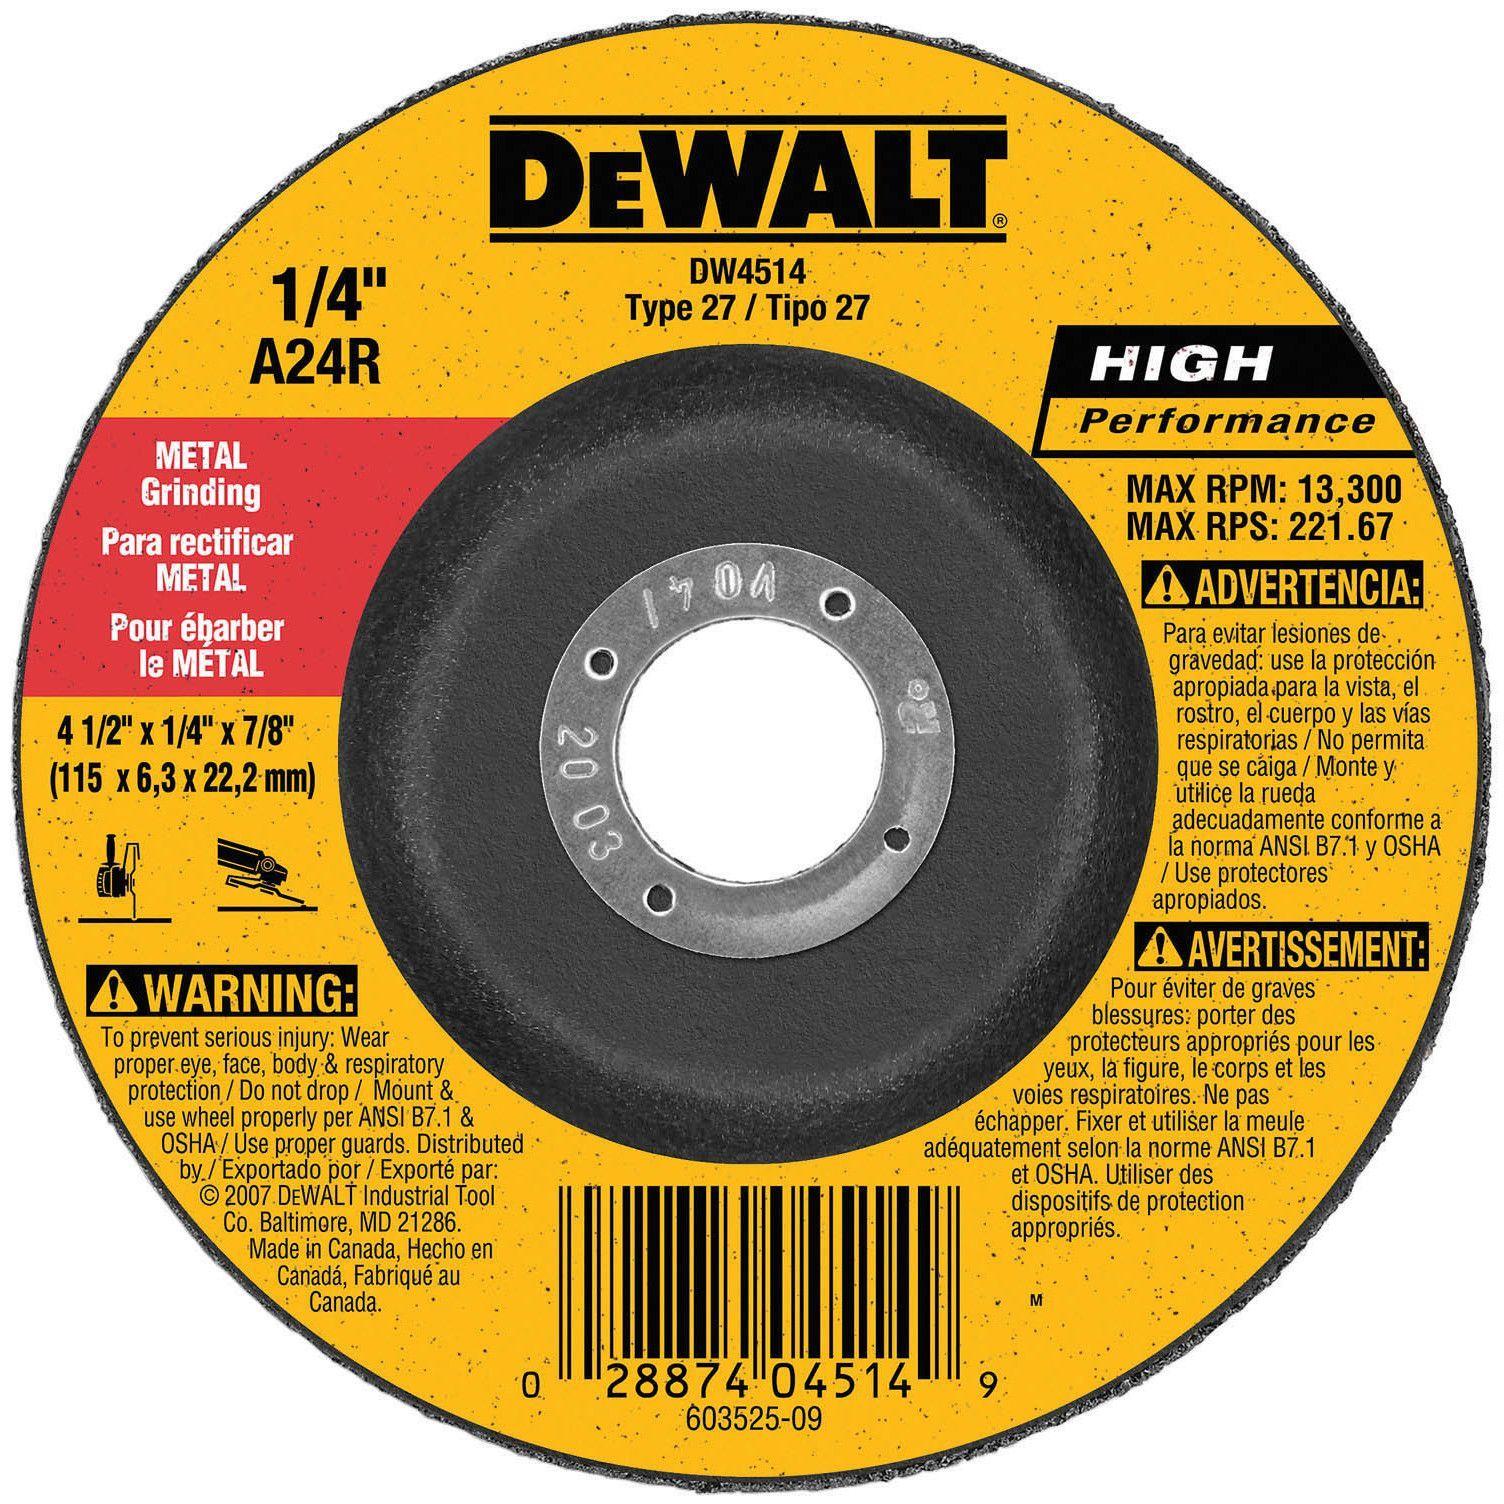 Stanley Dewalt DW4514 Fast Cut Depressed Center Grinding Wheel ...